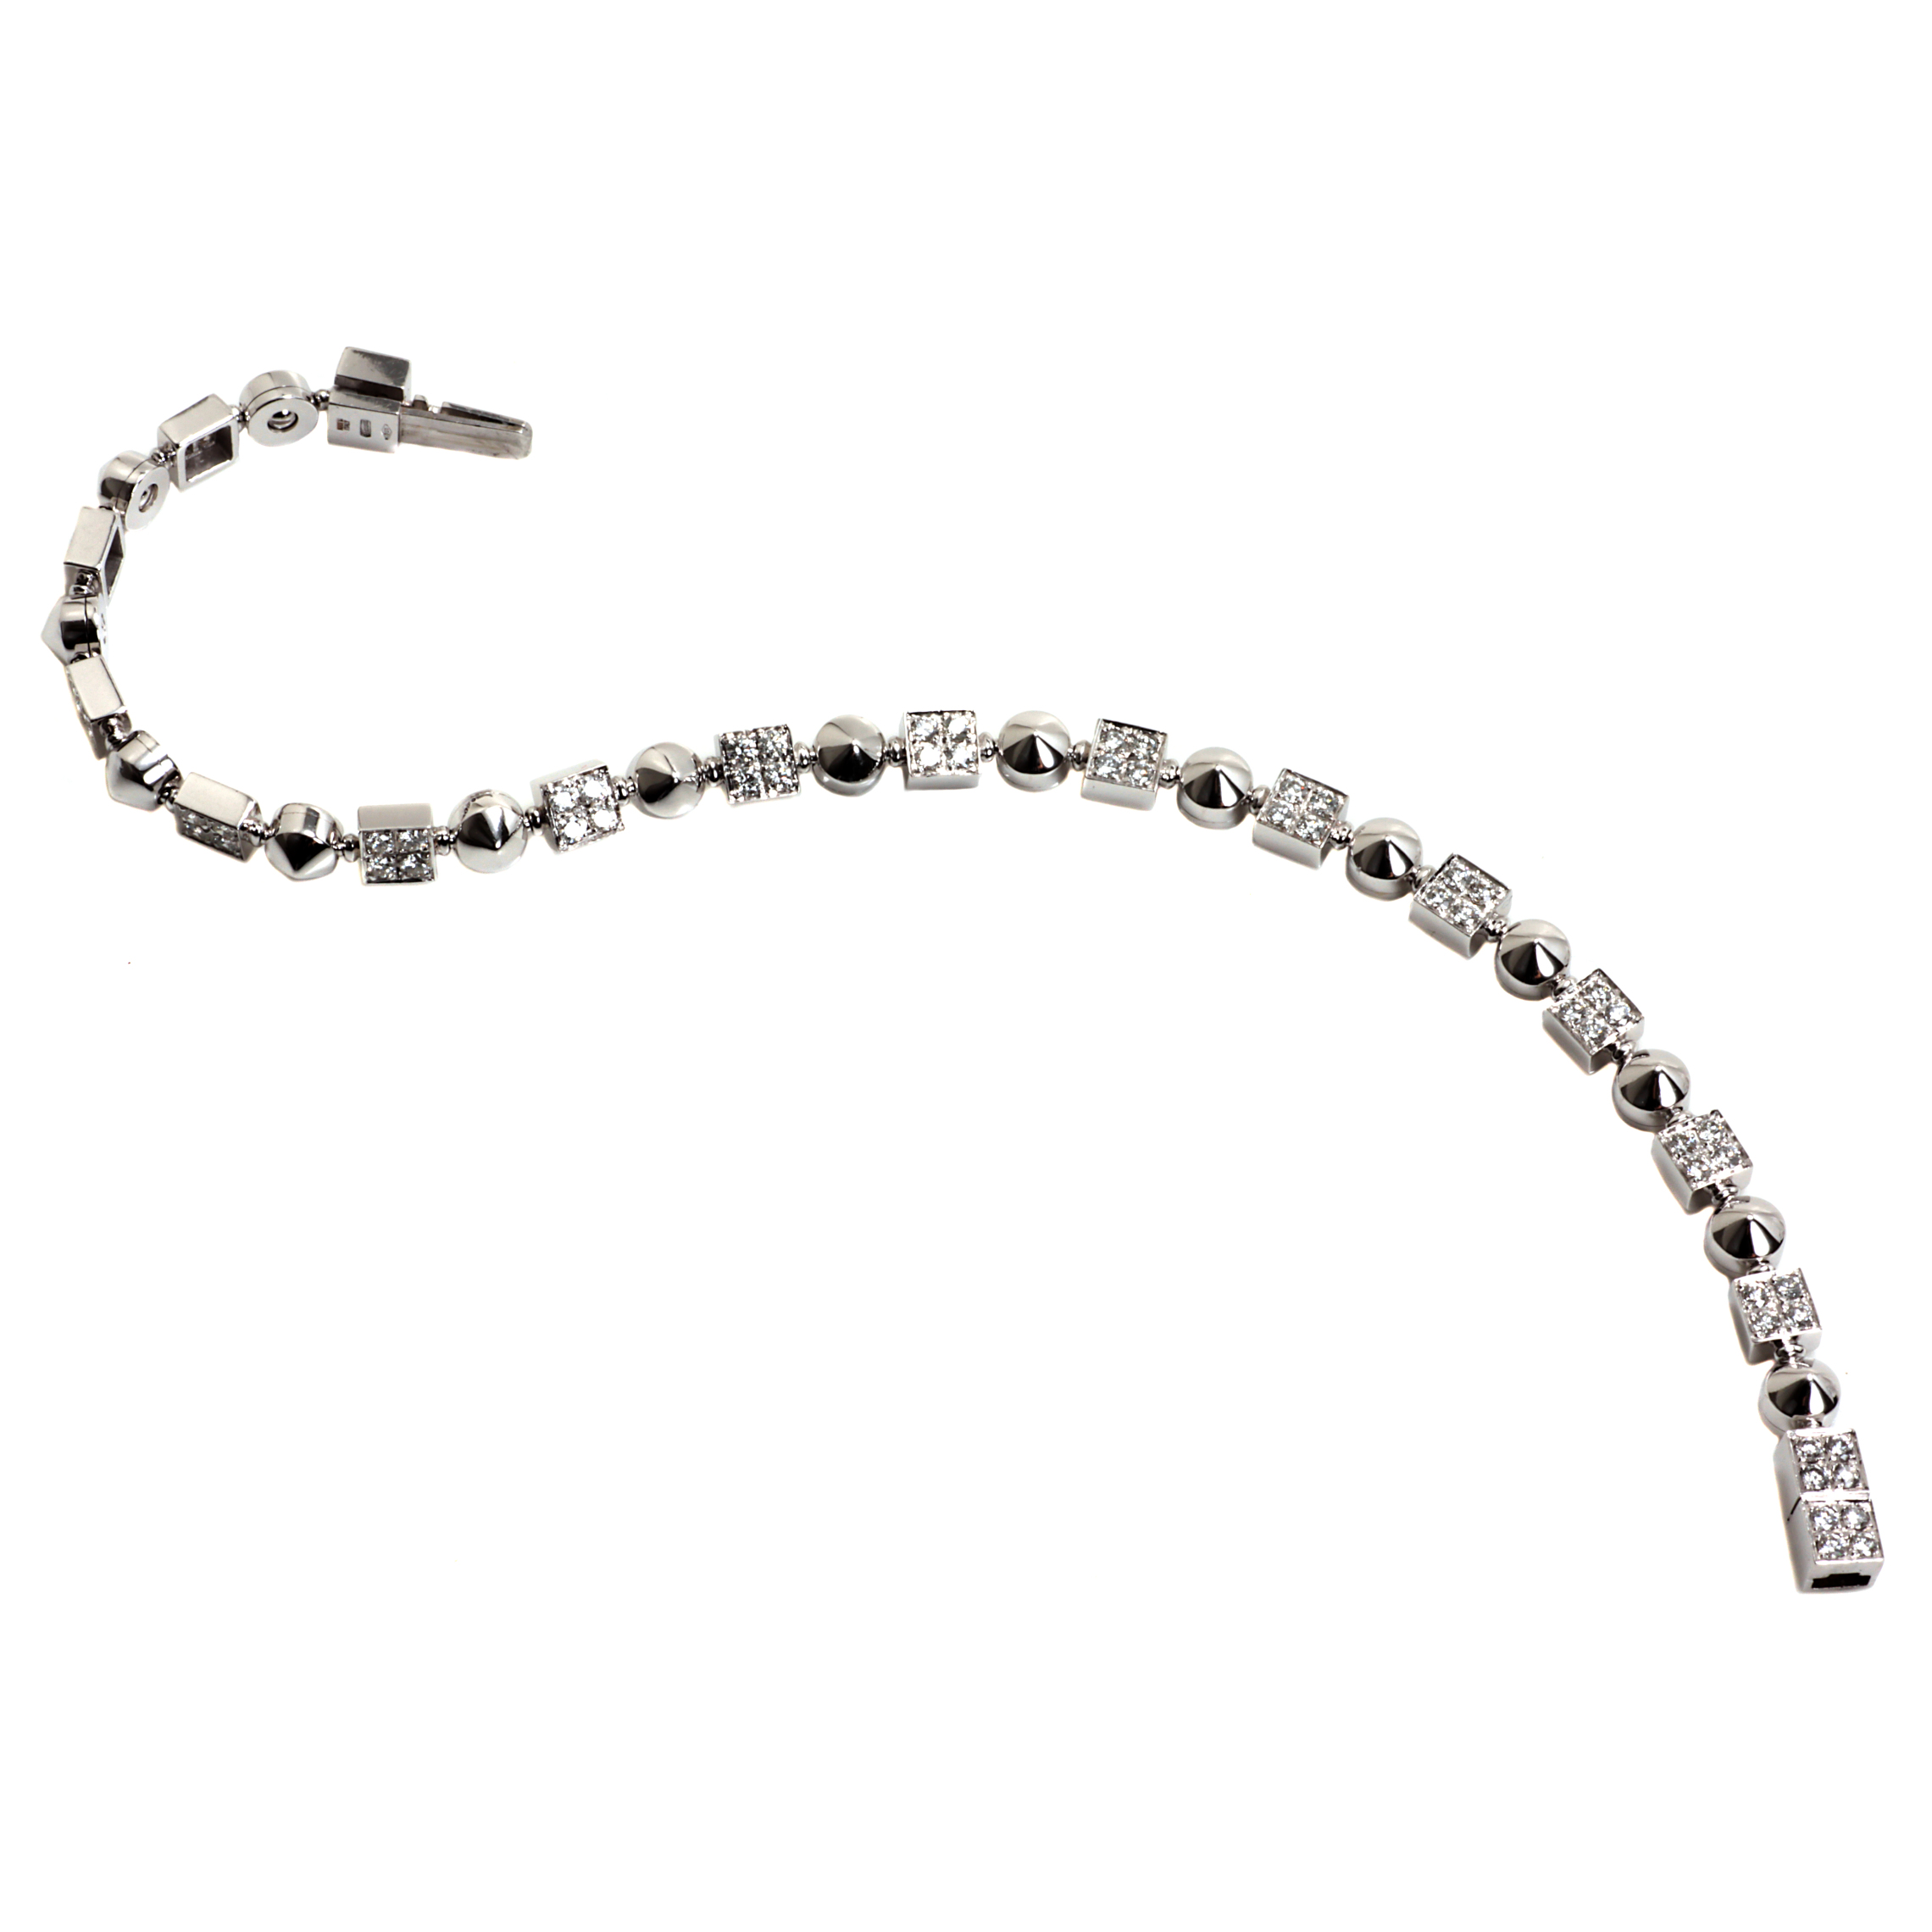 Bvlgari Lucea Diamond Bracelet in Gold